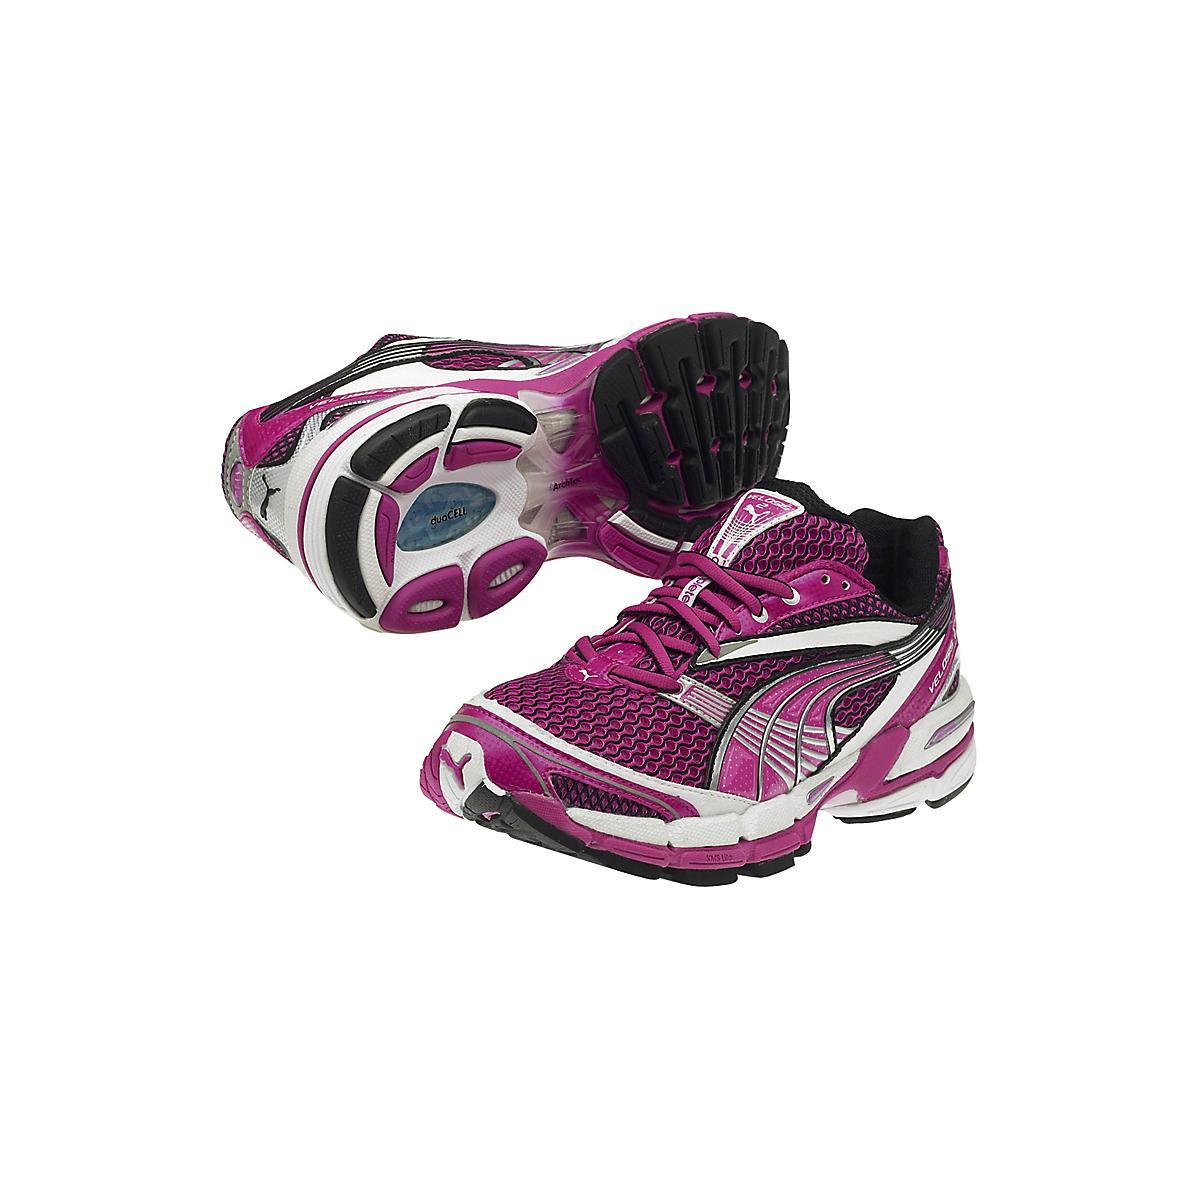 Gran universo Fontanero Contagioso  Womens PUMA Complete Velosis 2 Running Shoe at Road Runner Sports